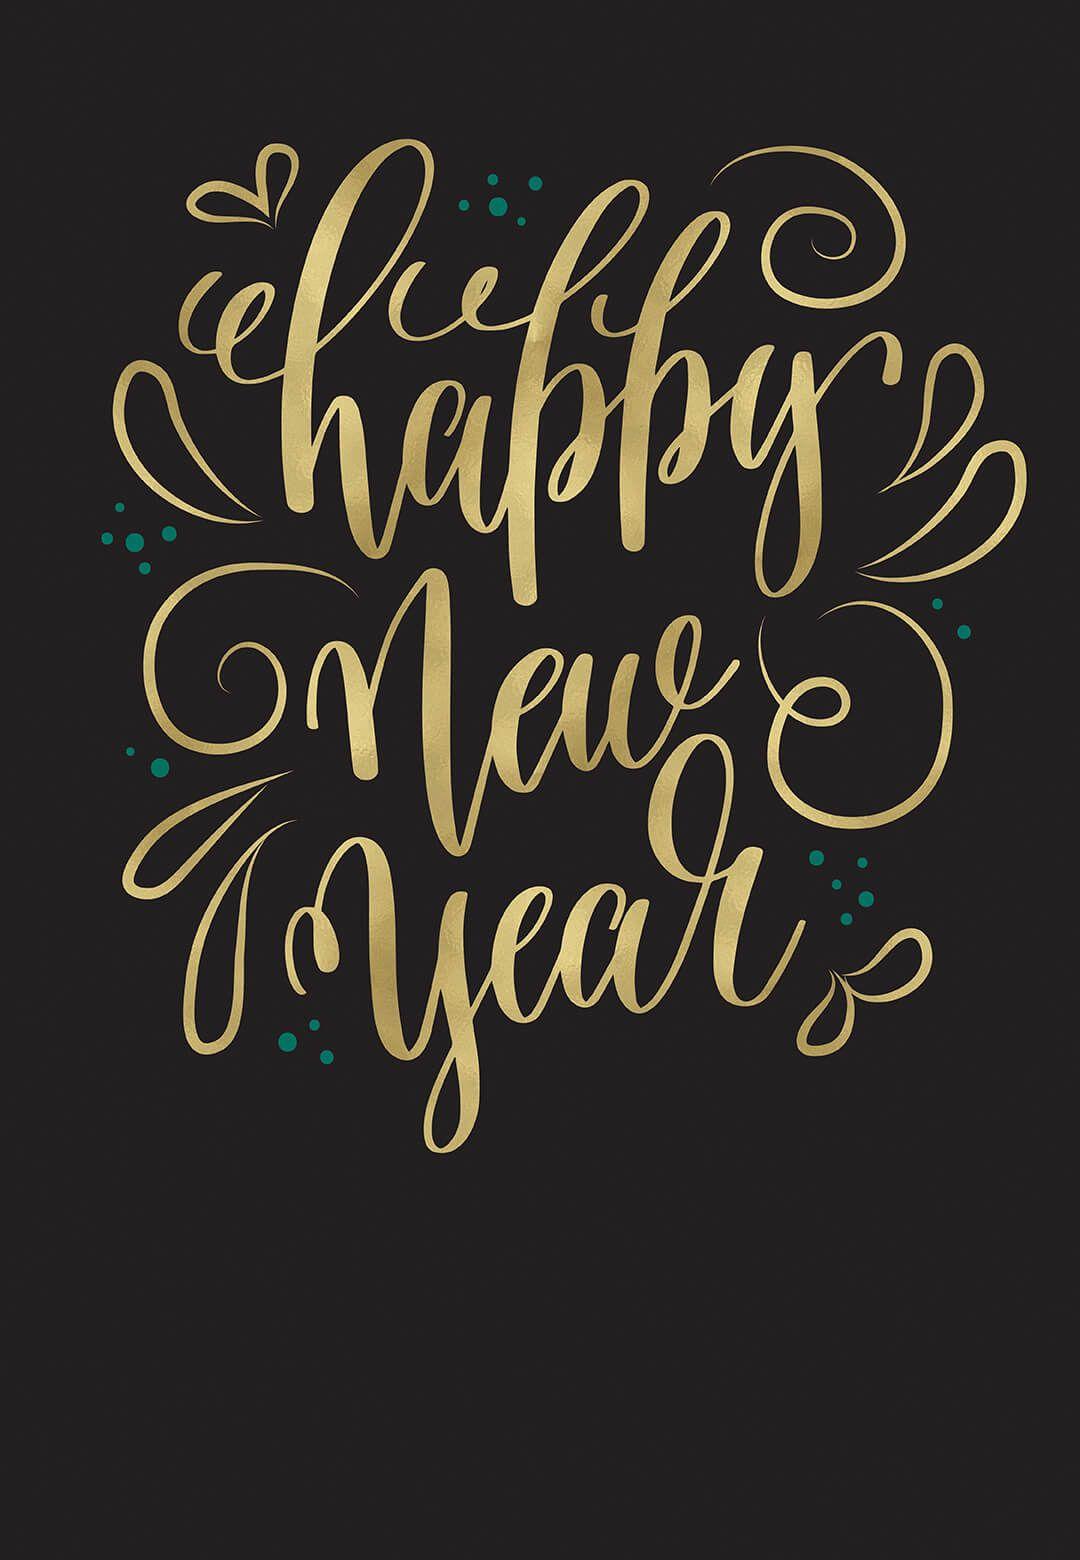 New Years Swirls Free New Year Card Greetings Island